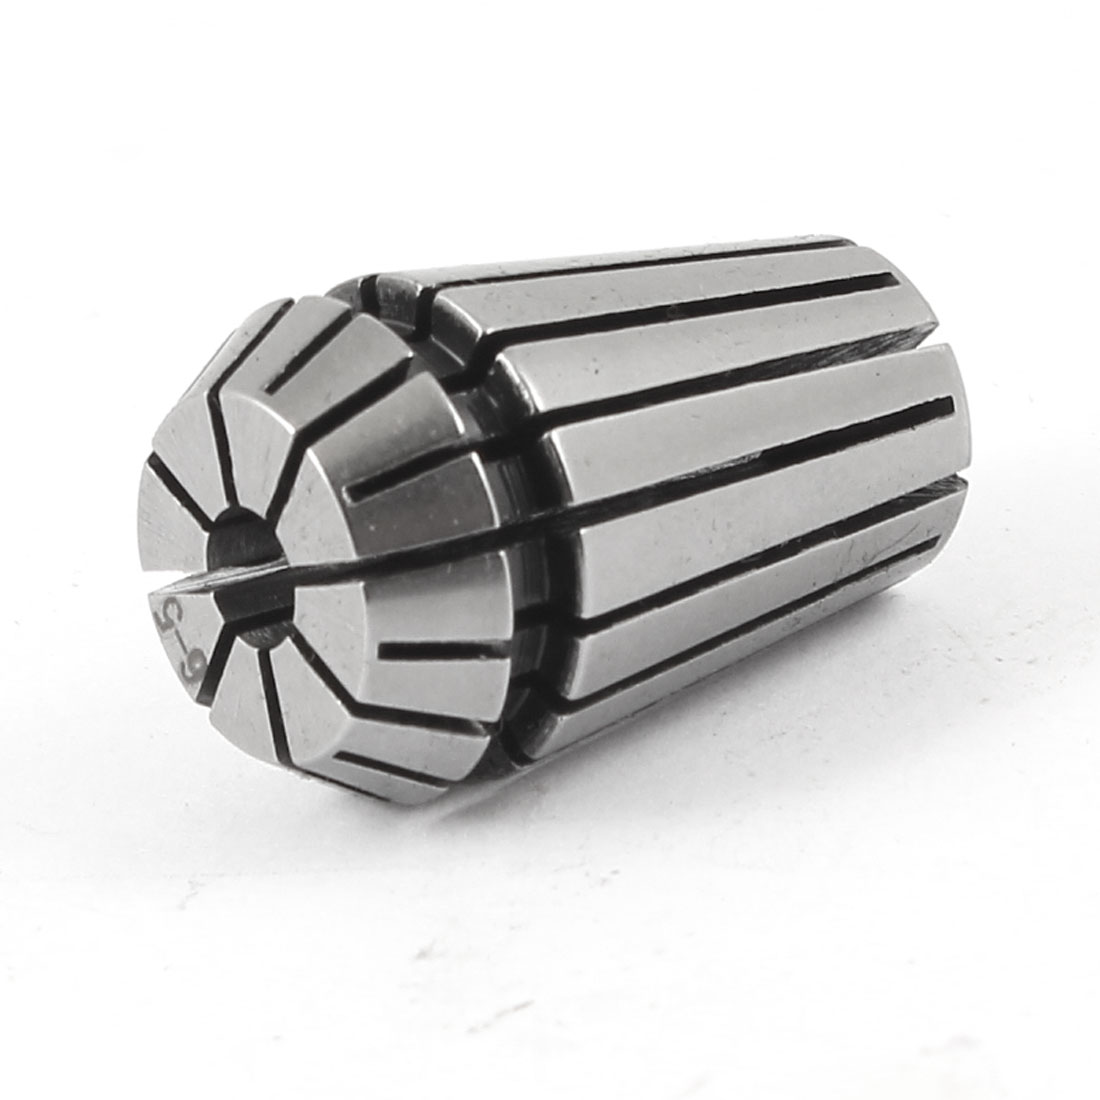 CNC Lathe Reaming 6mm 15/64 Inch ER20-6 Spring Collet Chuck Holder - image 1 of 1